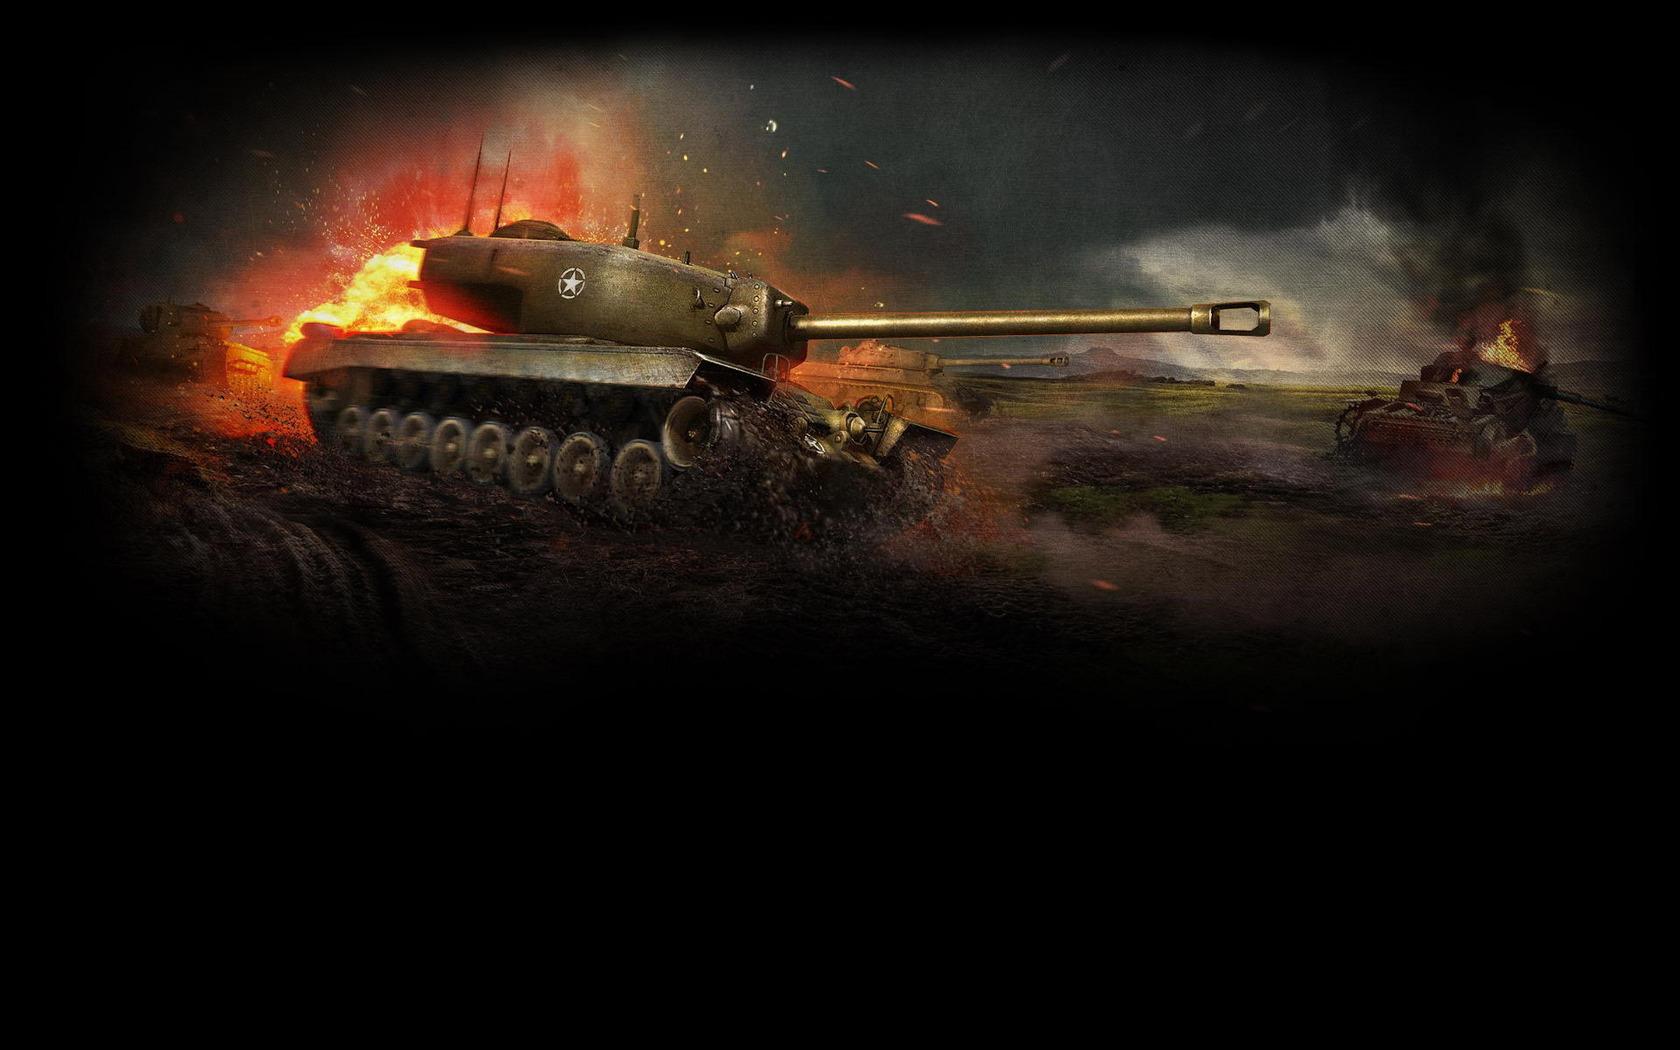 world of tanks 0912 запрещенные сборки модов Сборка модов World of Tanks